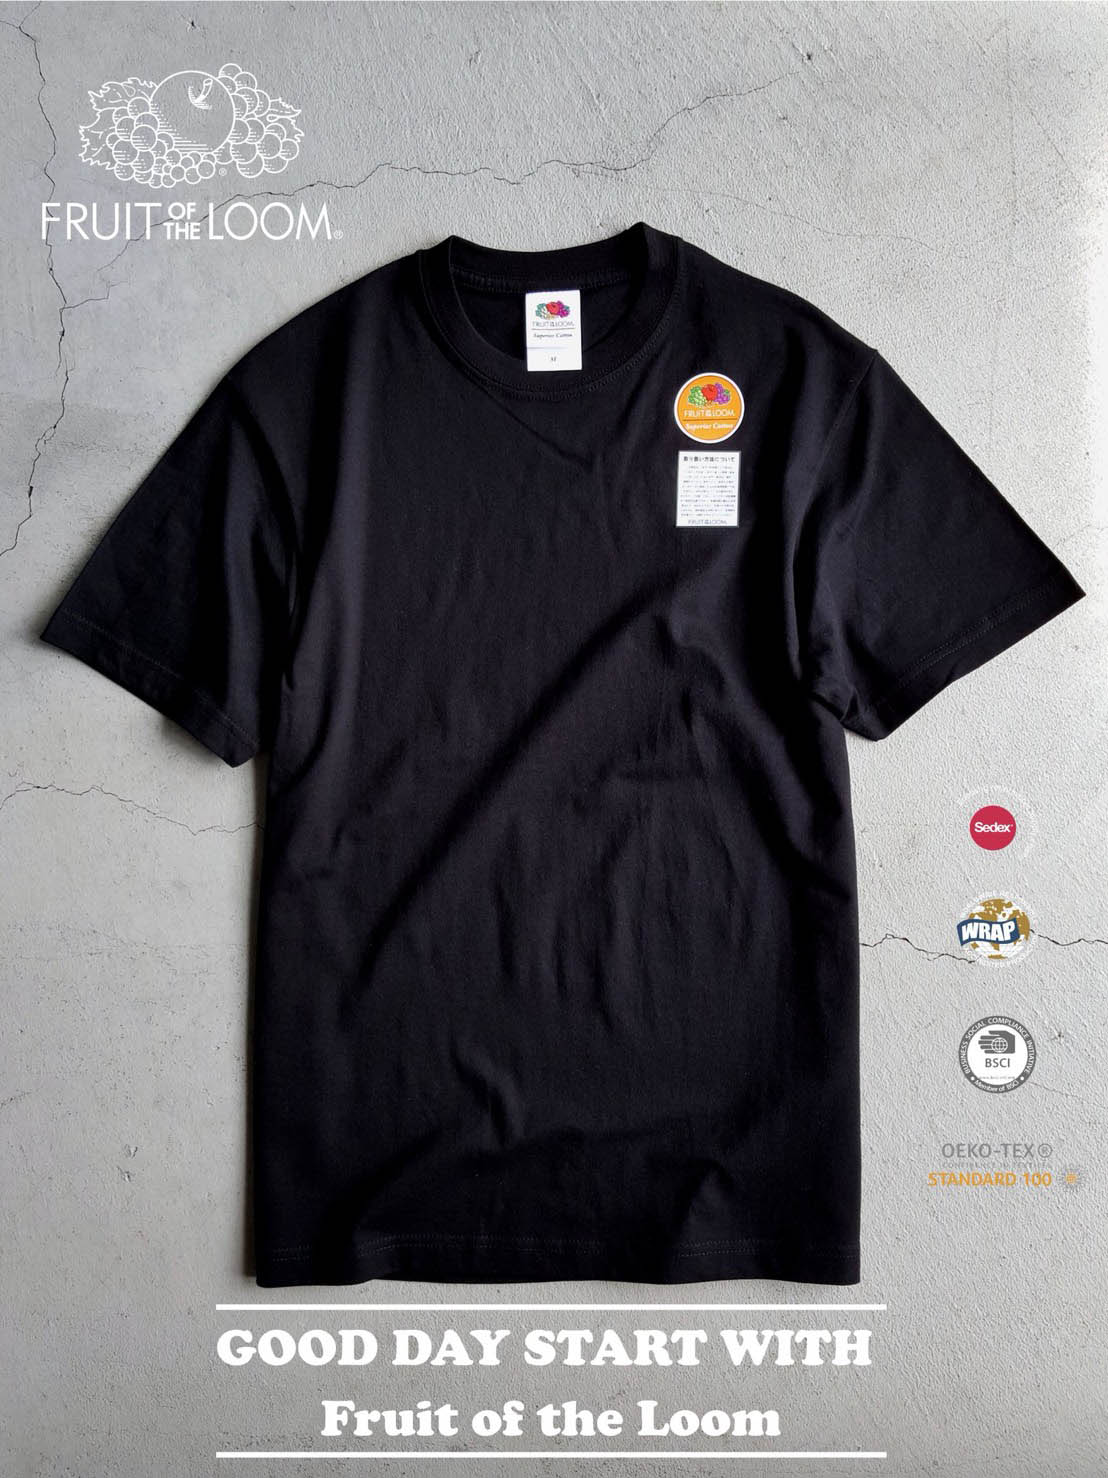 FRUIT OF THE LOOM 水果牌 FL1850 美國純棉 5.3oz 高磅數 短T 素T (黑色BK)